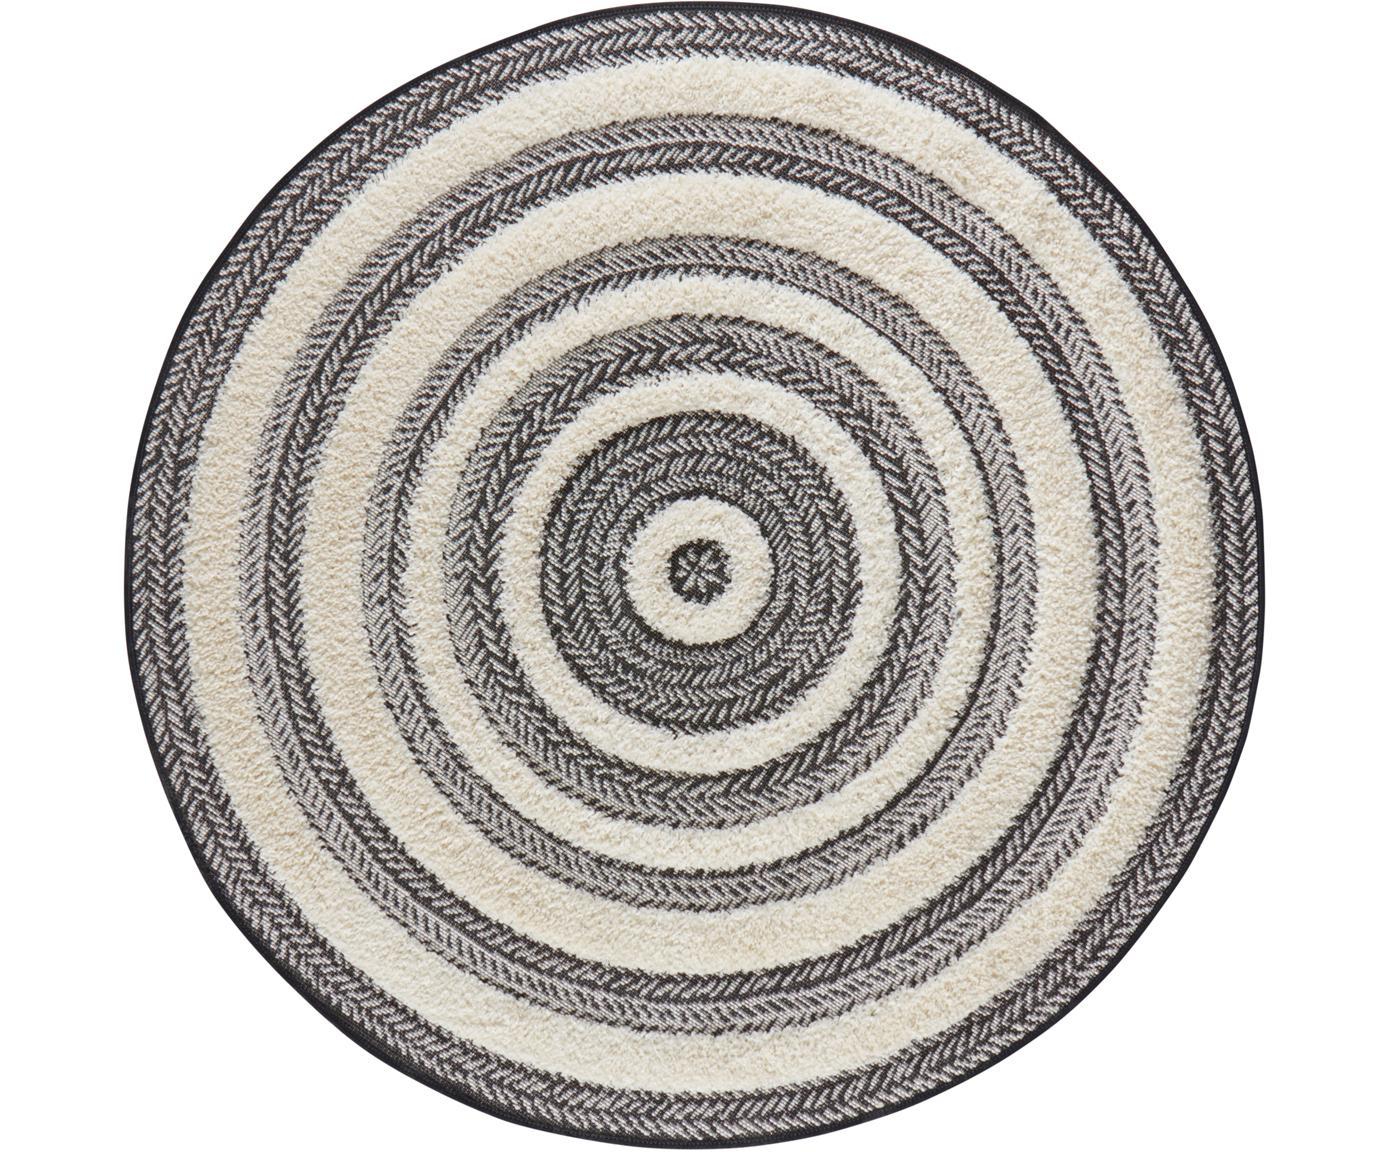 Alfombra redonda texturizada de interior/exterior Nador, 100%polipropileno, Gris, crema, Ø 160 cm (Tamaño L)